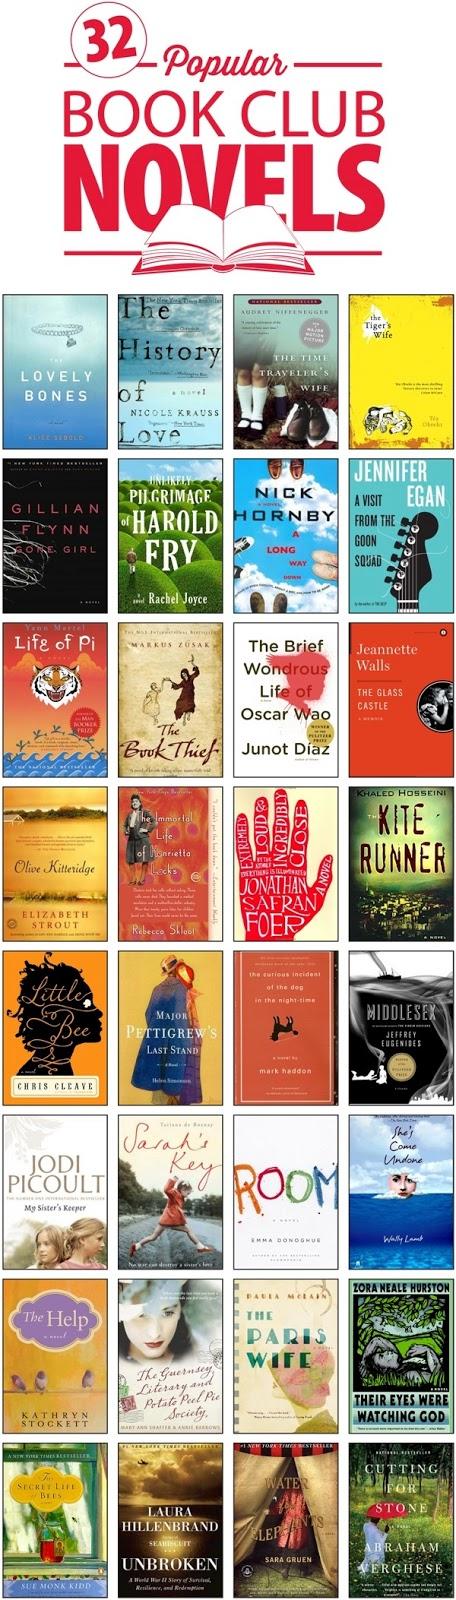 Books & Clubs